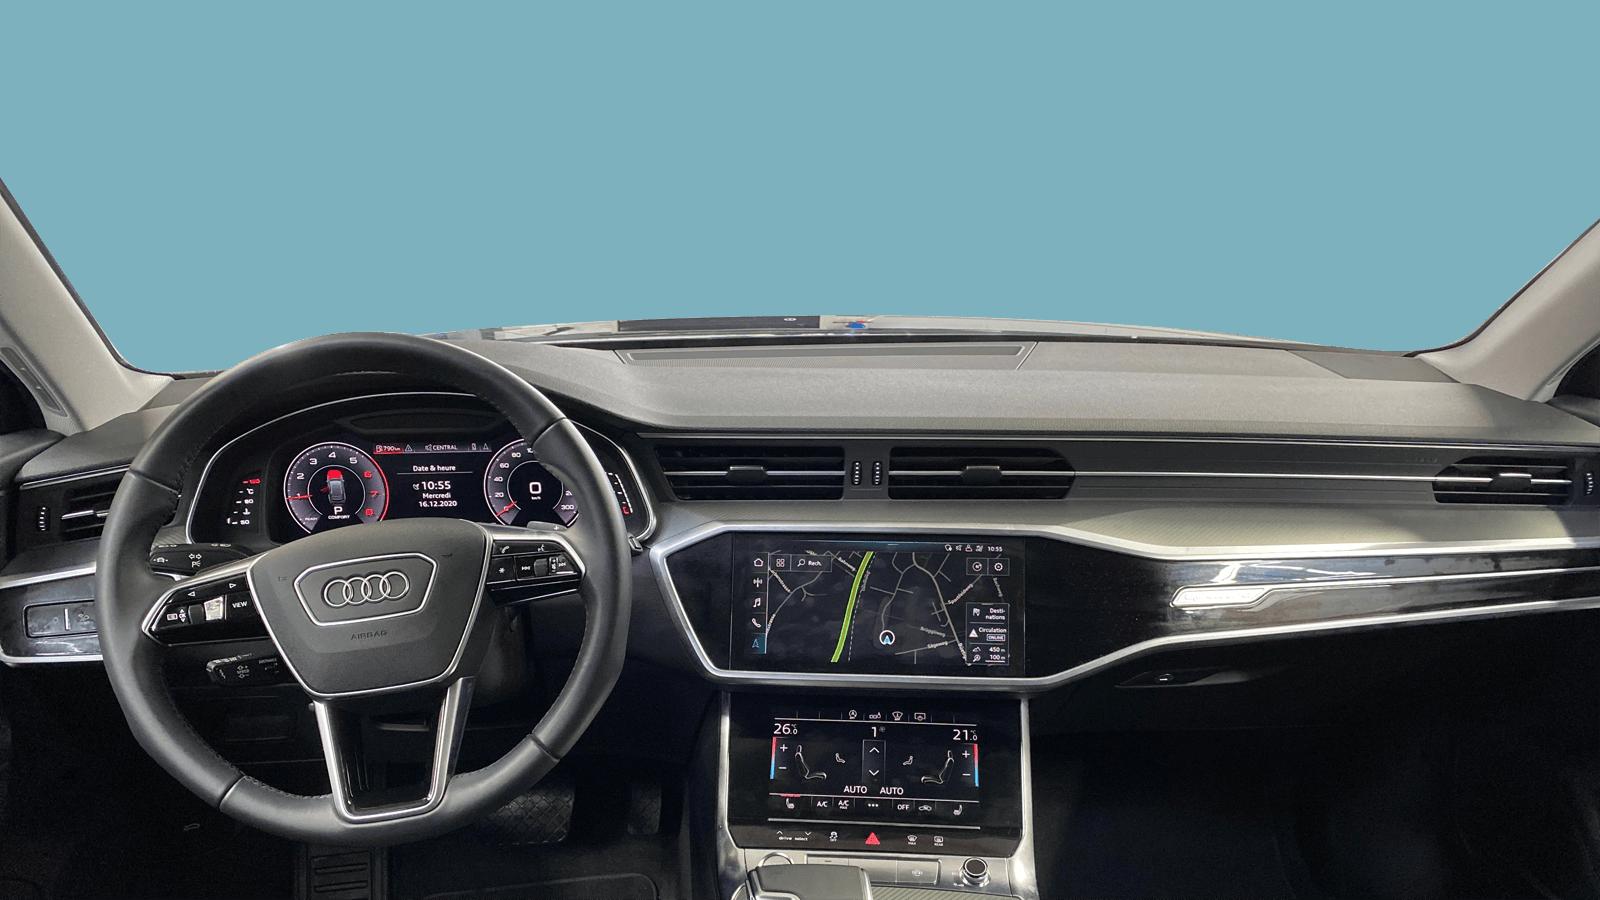 Audi A6 Avant Black interior - Clyde car subscription